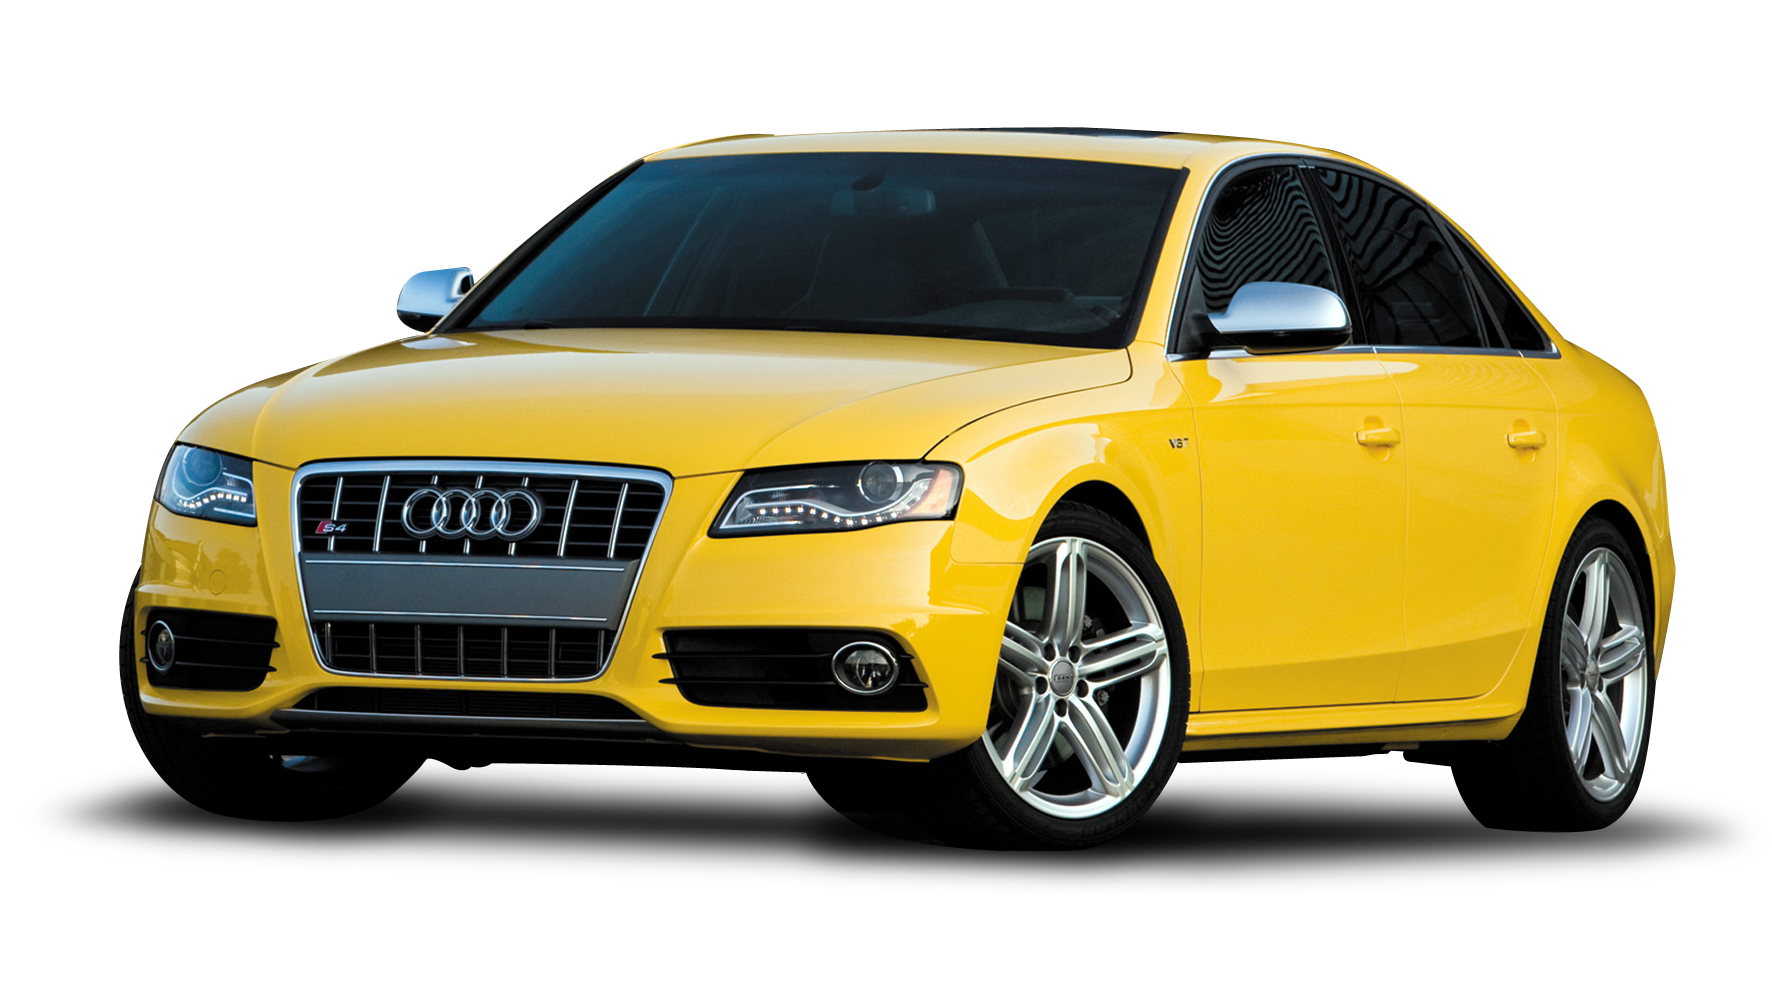 Yellow Audi Car Png Image - Car, Transparent background PNG HD thumbnail